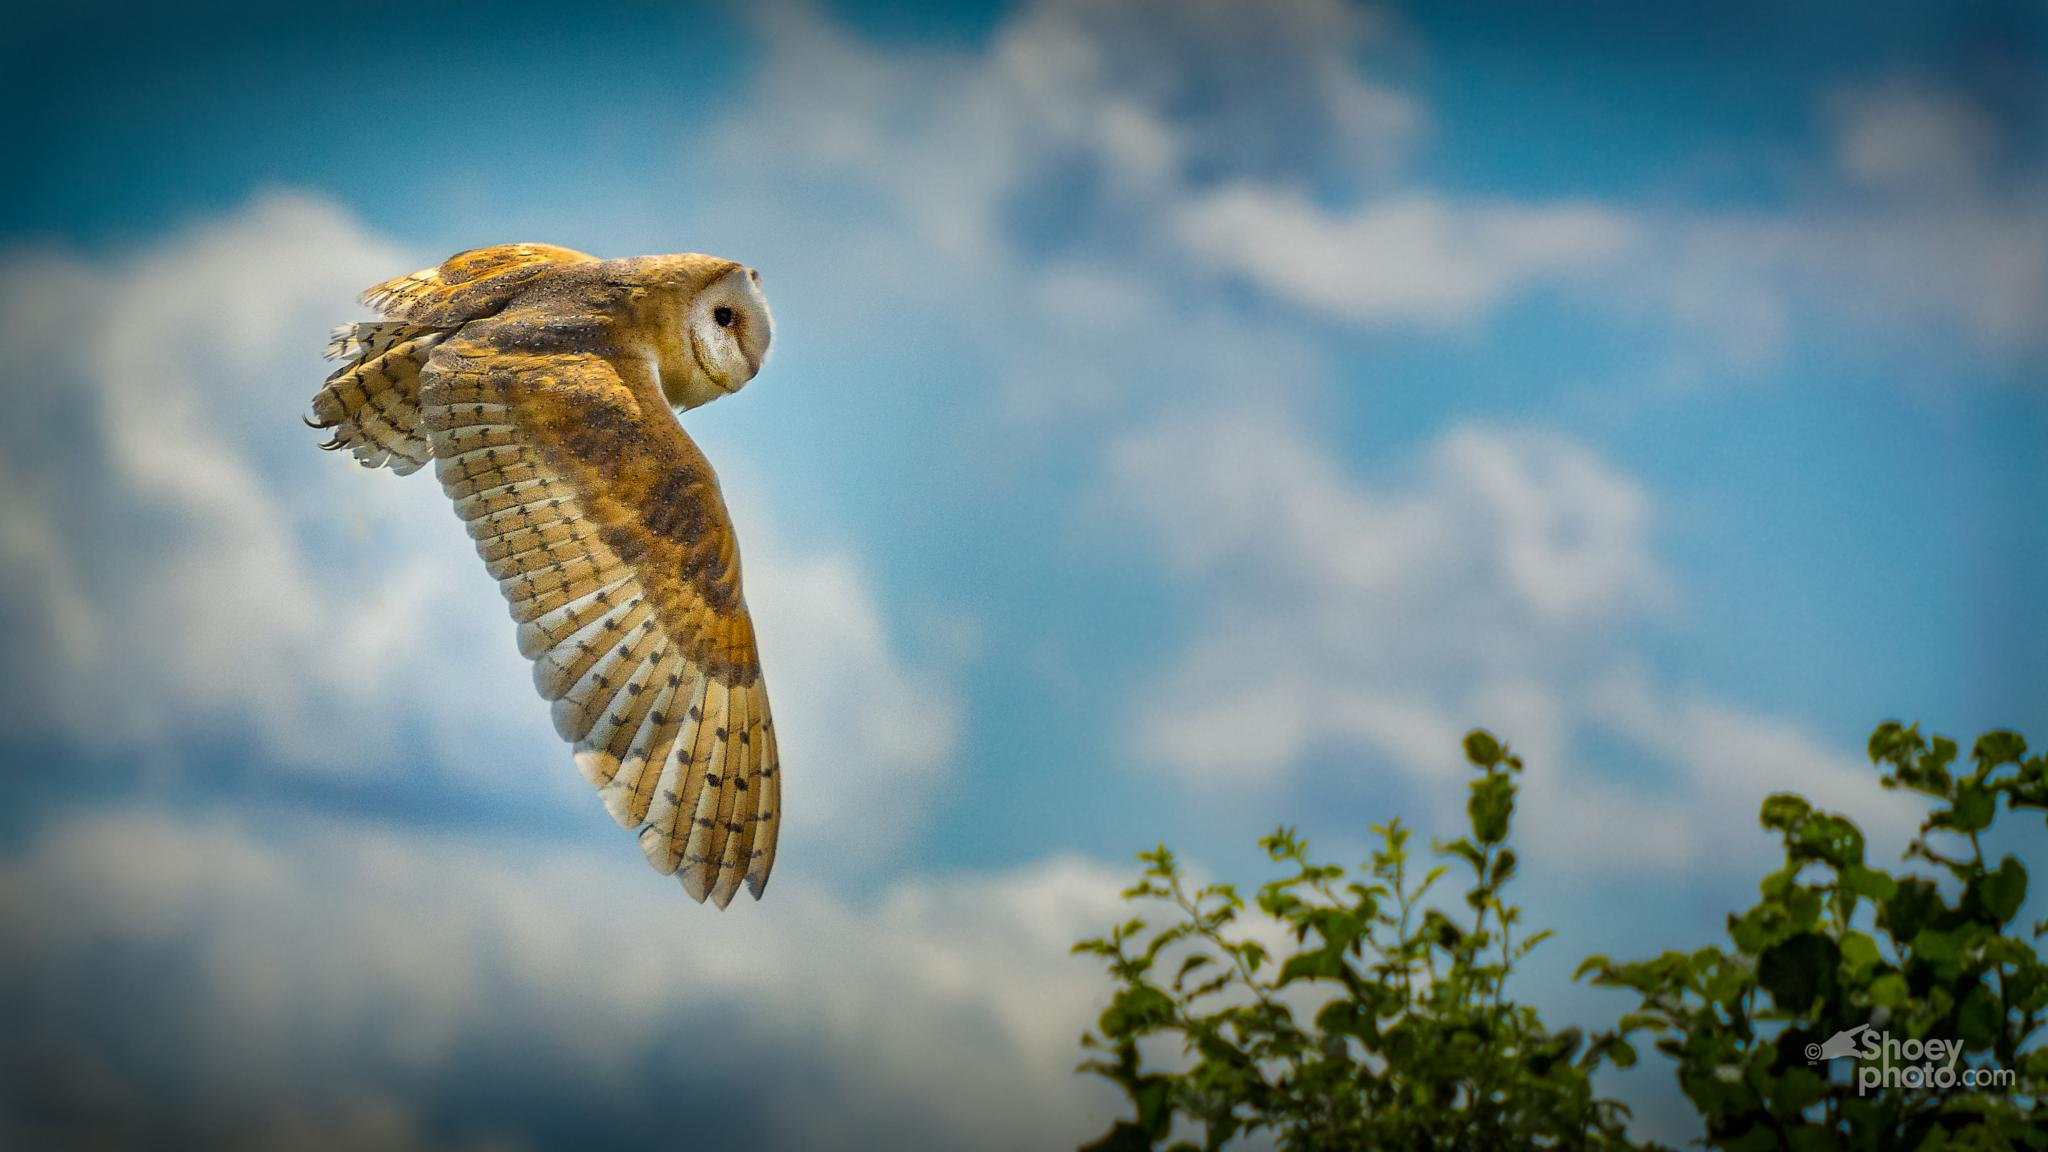 The Barn Owl by Shoeyphoto.com